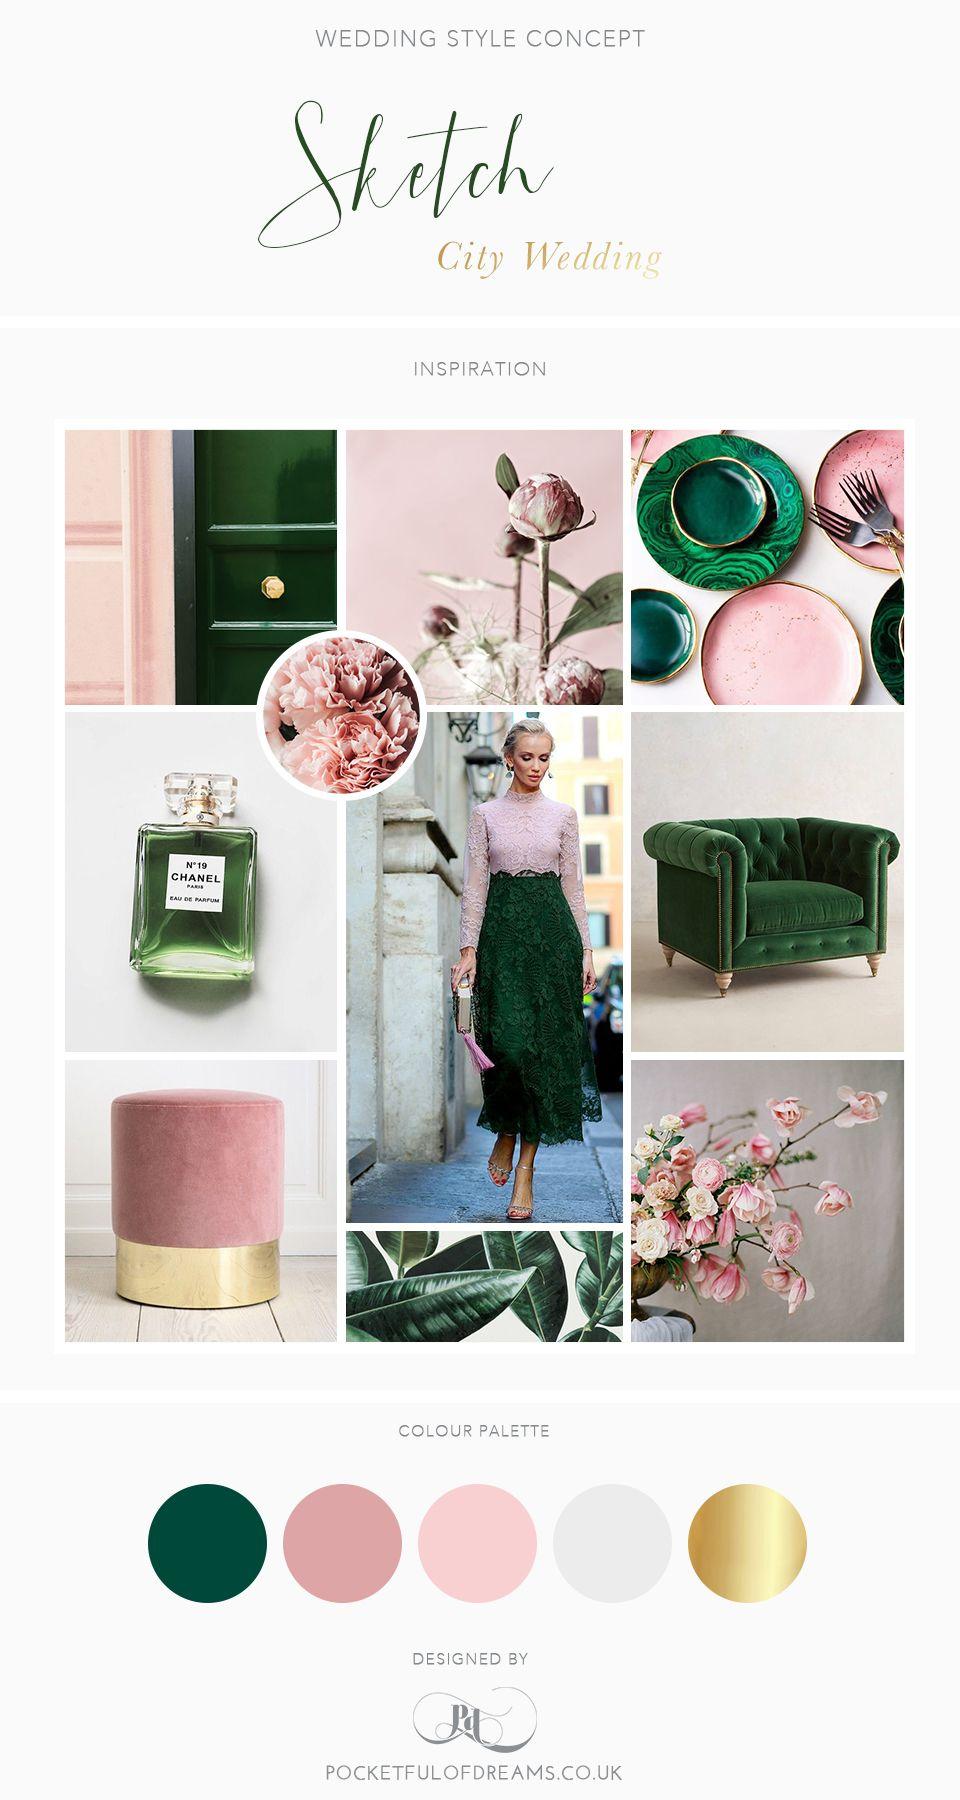 Creative Living Rooms For Style Inspiration Palette: A Sketch London Wedding: Rose Quartz & Malachite